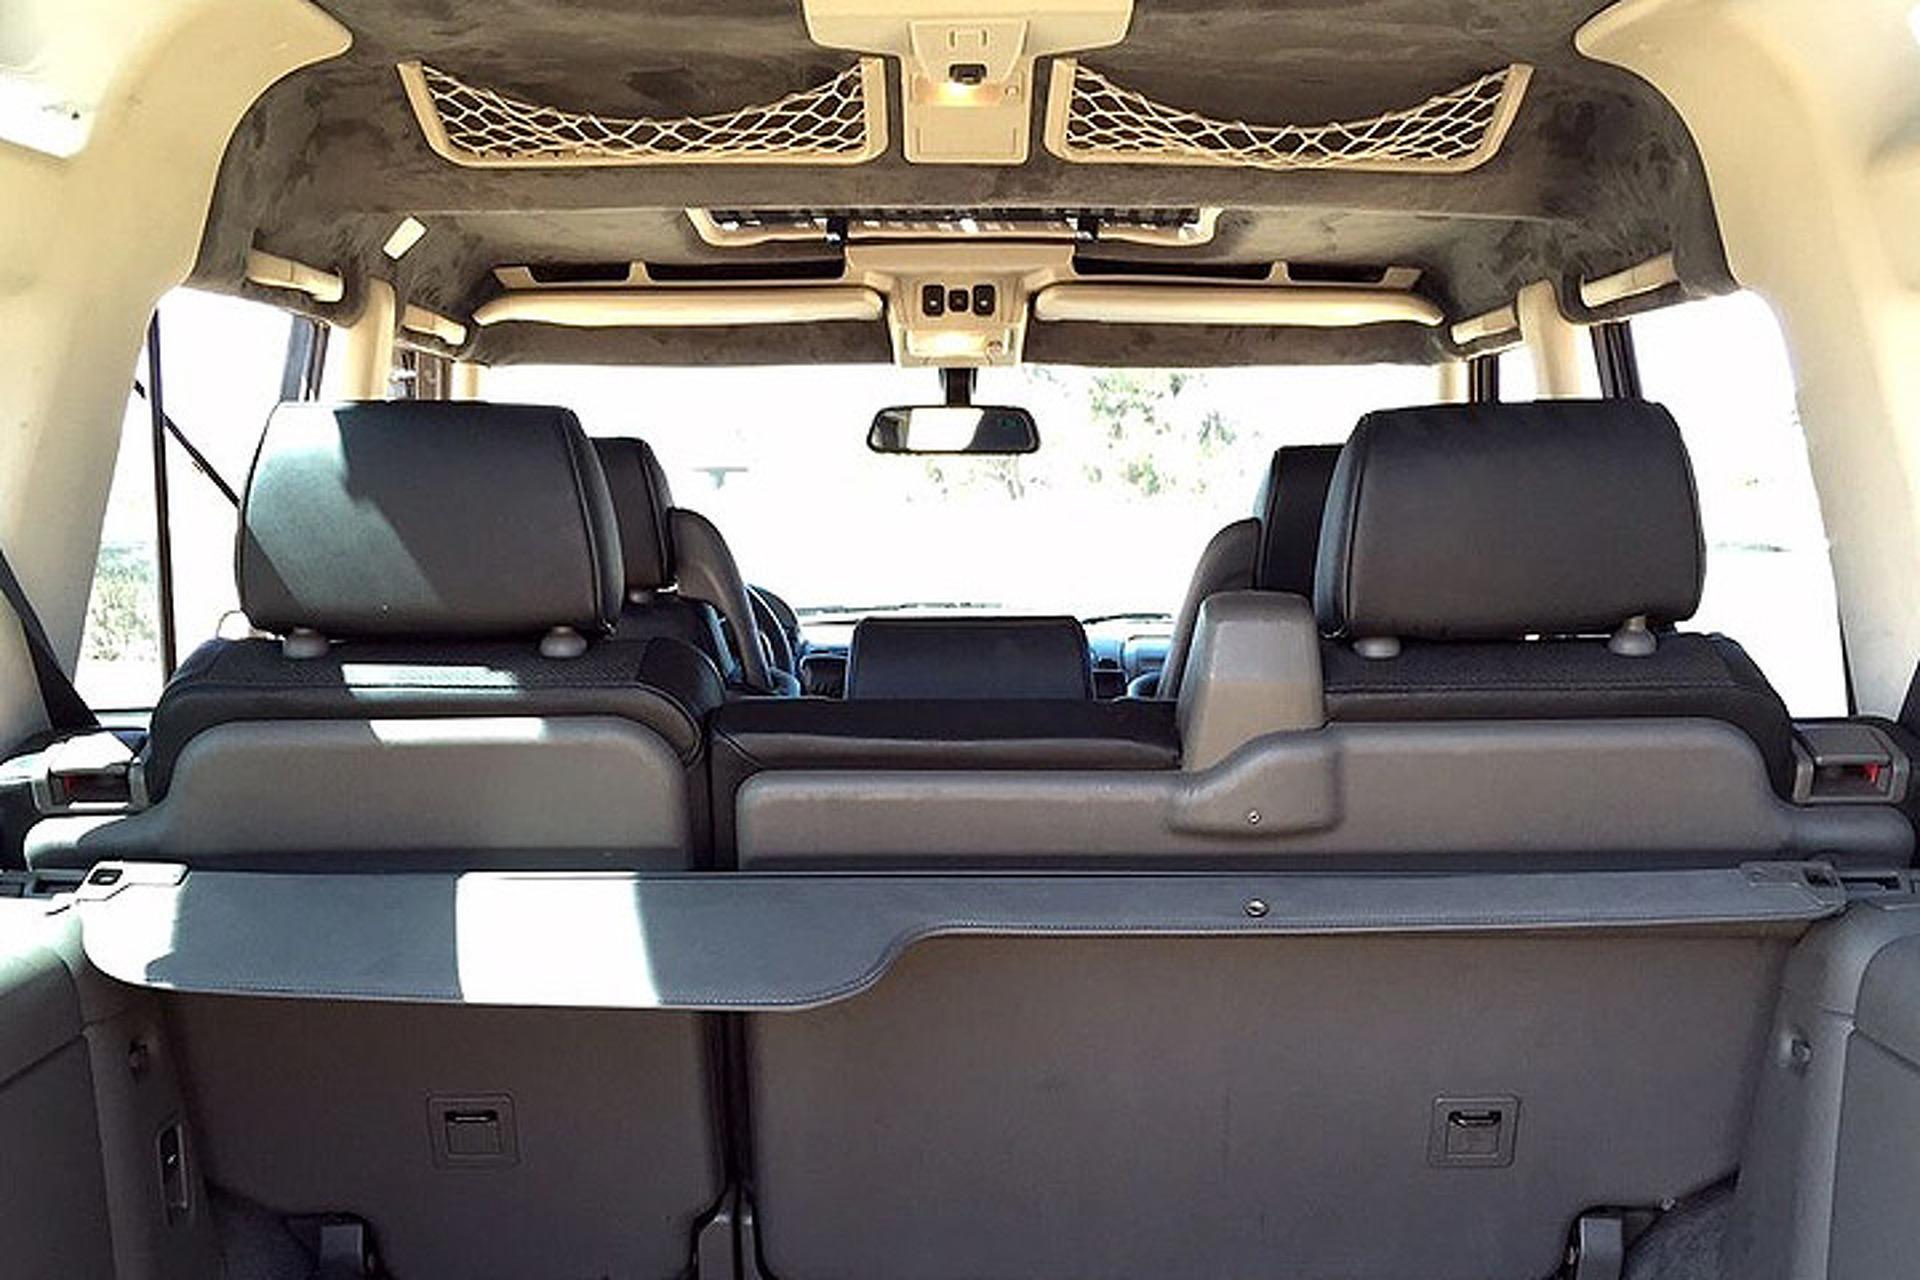 Kalahari Edition: An '02 Land Rover That Begs for Adventure